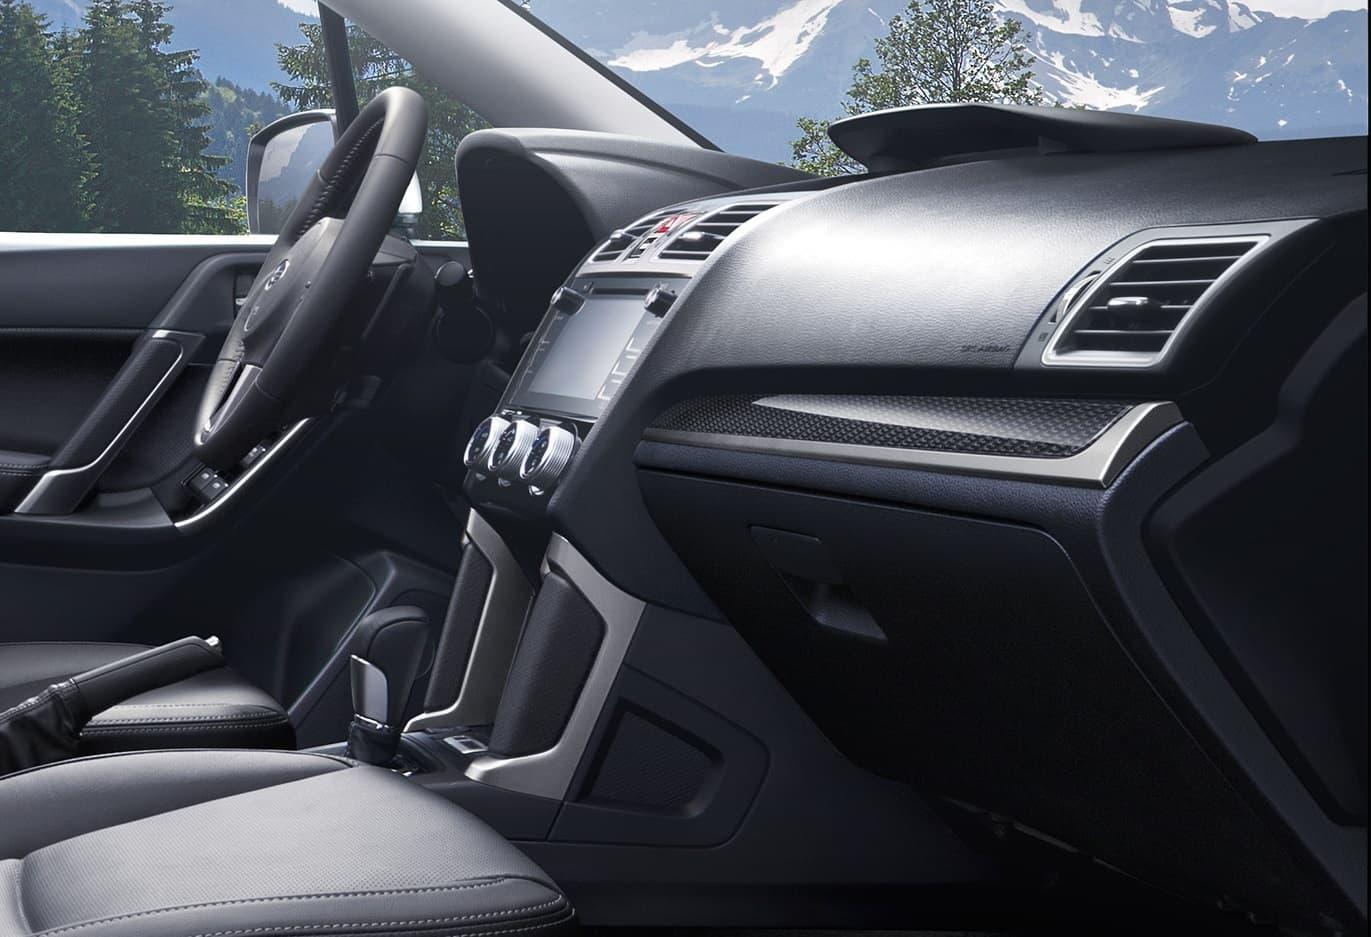 Subaru Forester 19 Interior 2